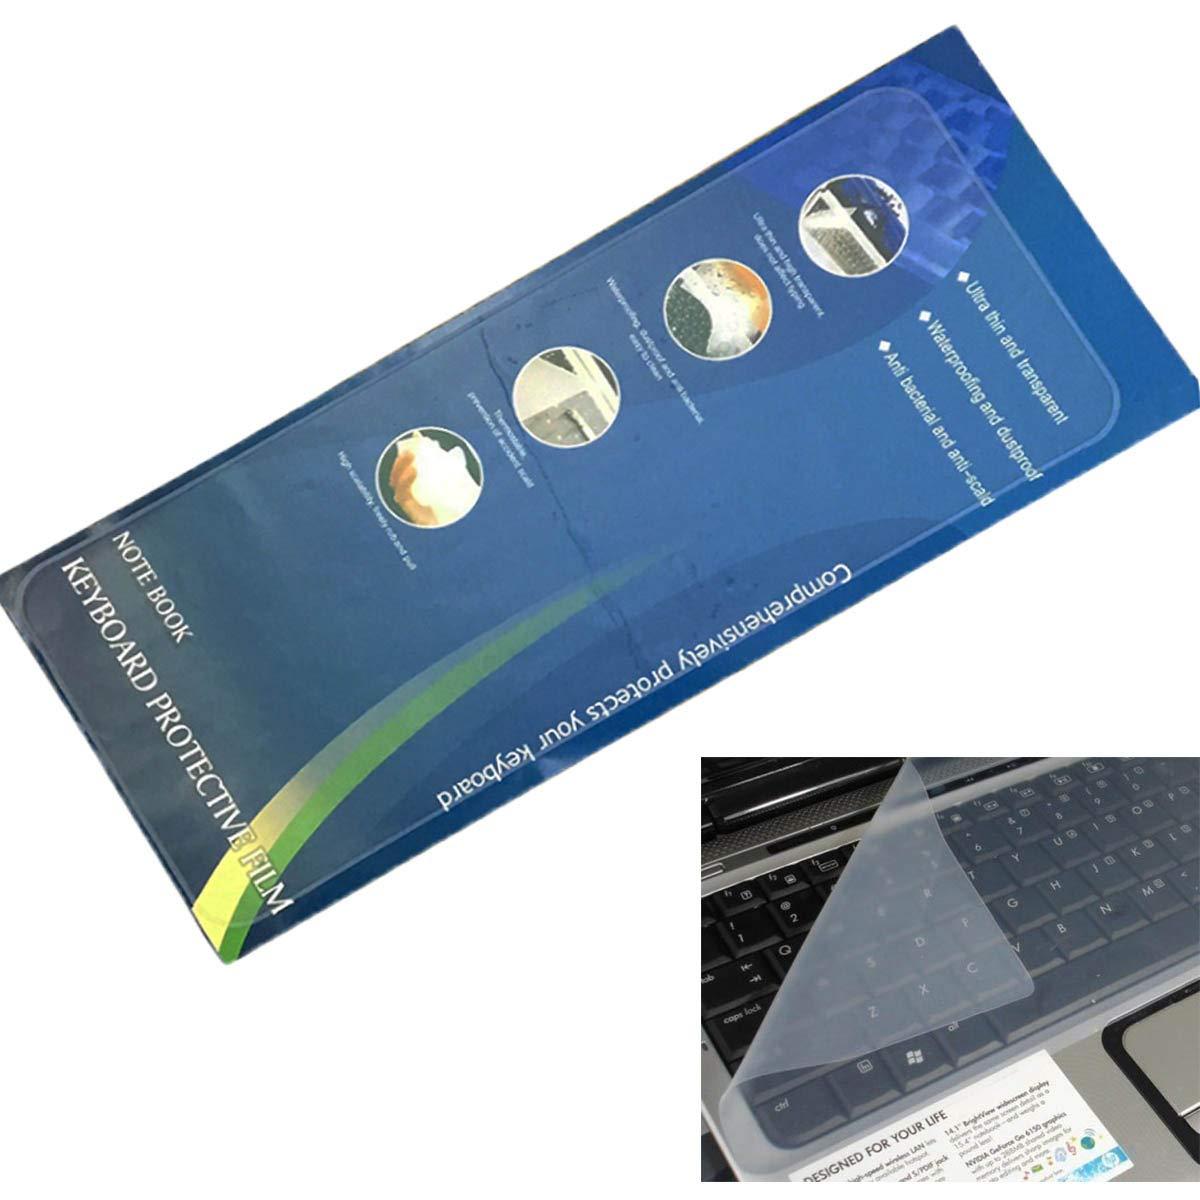 with Frame for HP P//N wangpeng New US Keyboard 90.4ZA07.L01 SG-59300-XUA 768787-001 6037B0088501 SG-61300-XUA 738696-001 Laptop English Keyboard